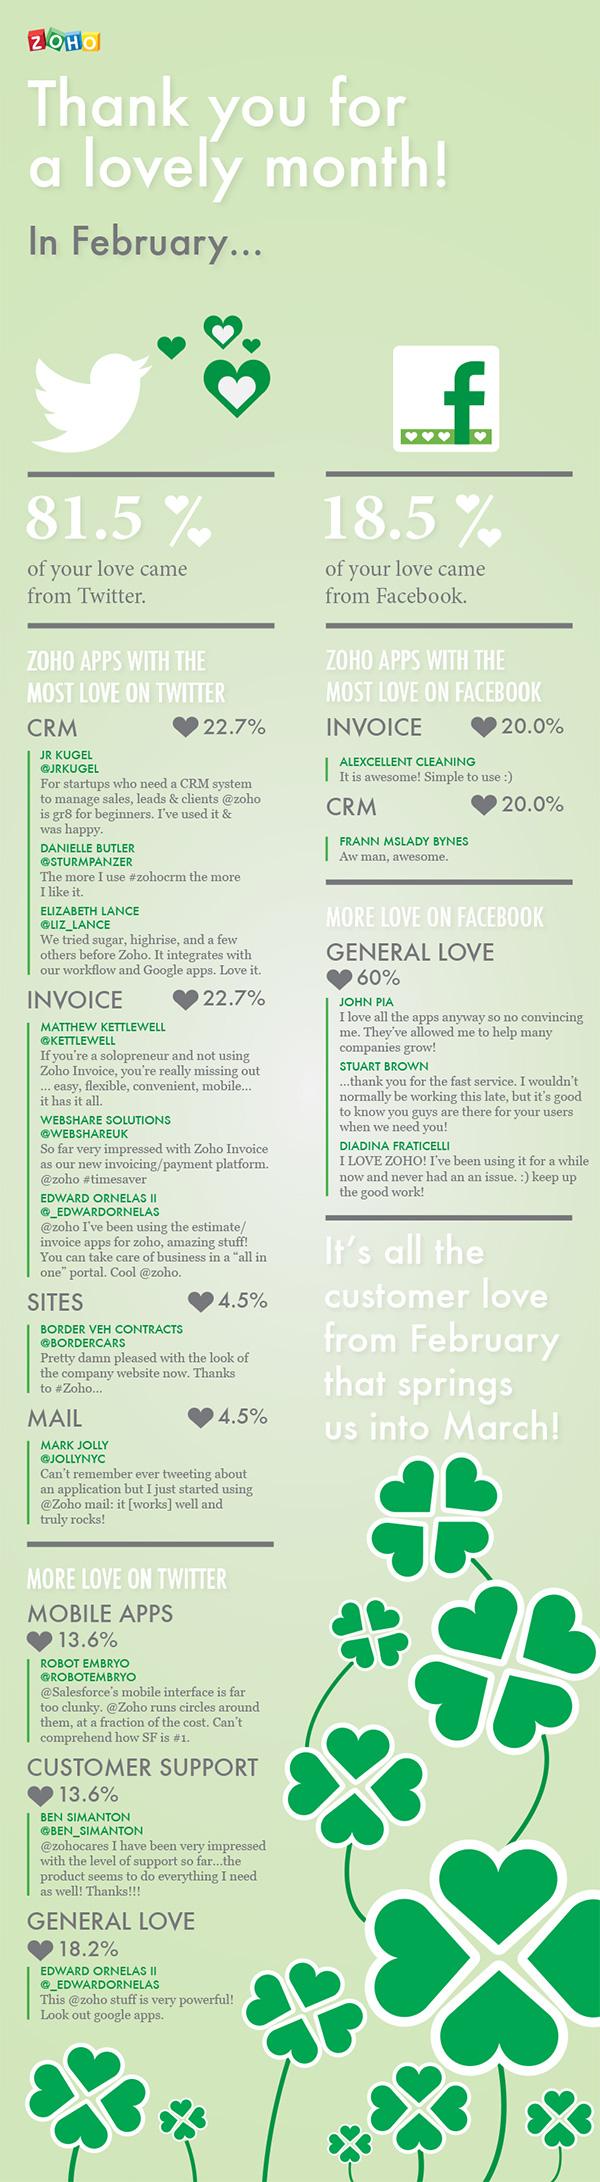 Customer Love Infographic